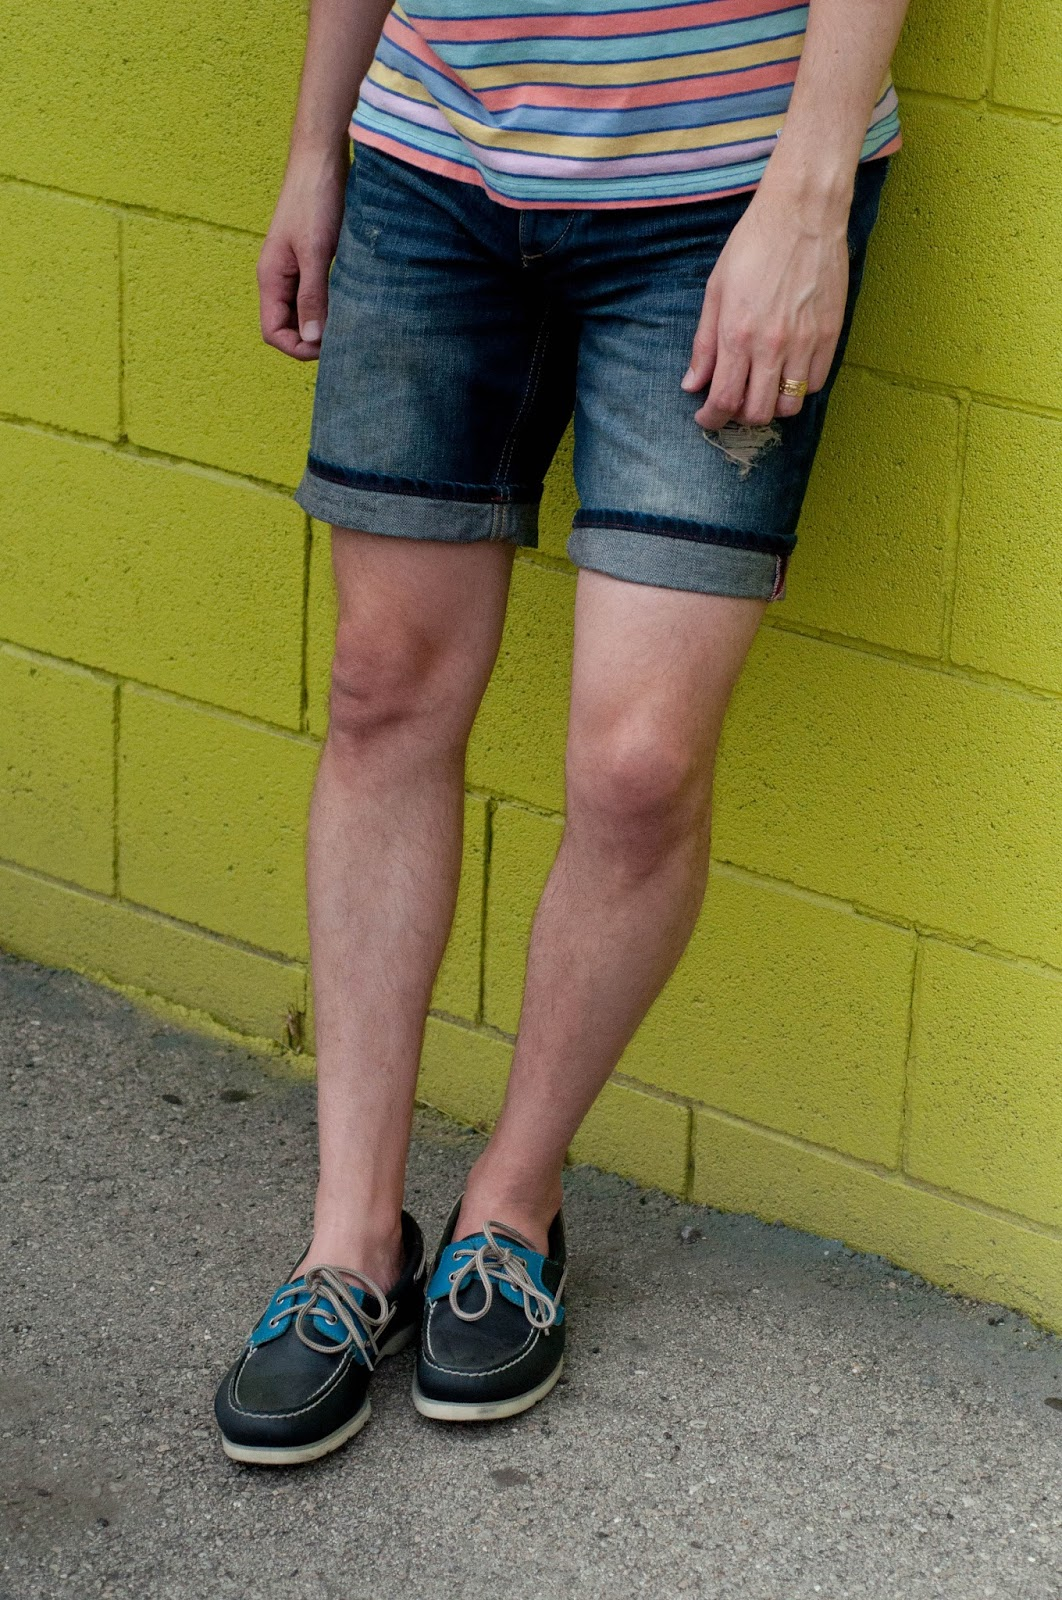 sperry topsider, authentic boat shoe, zara shorts, zara Bermuda shorts, ootd, mens style